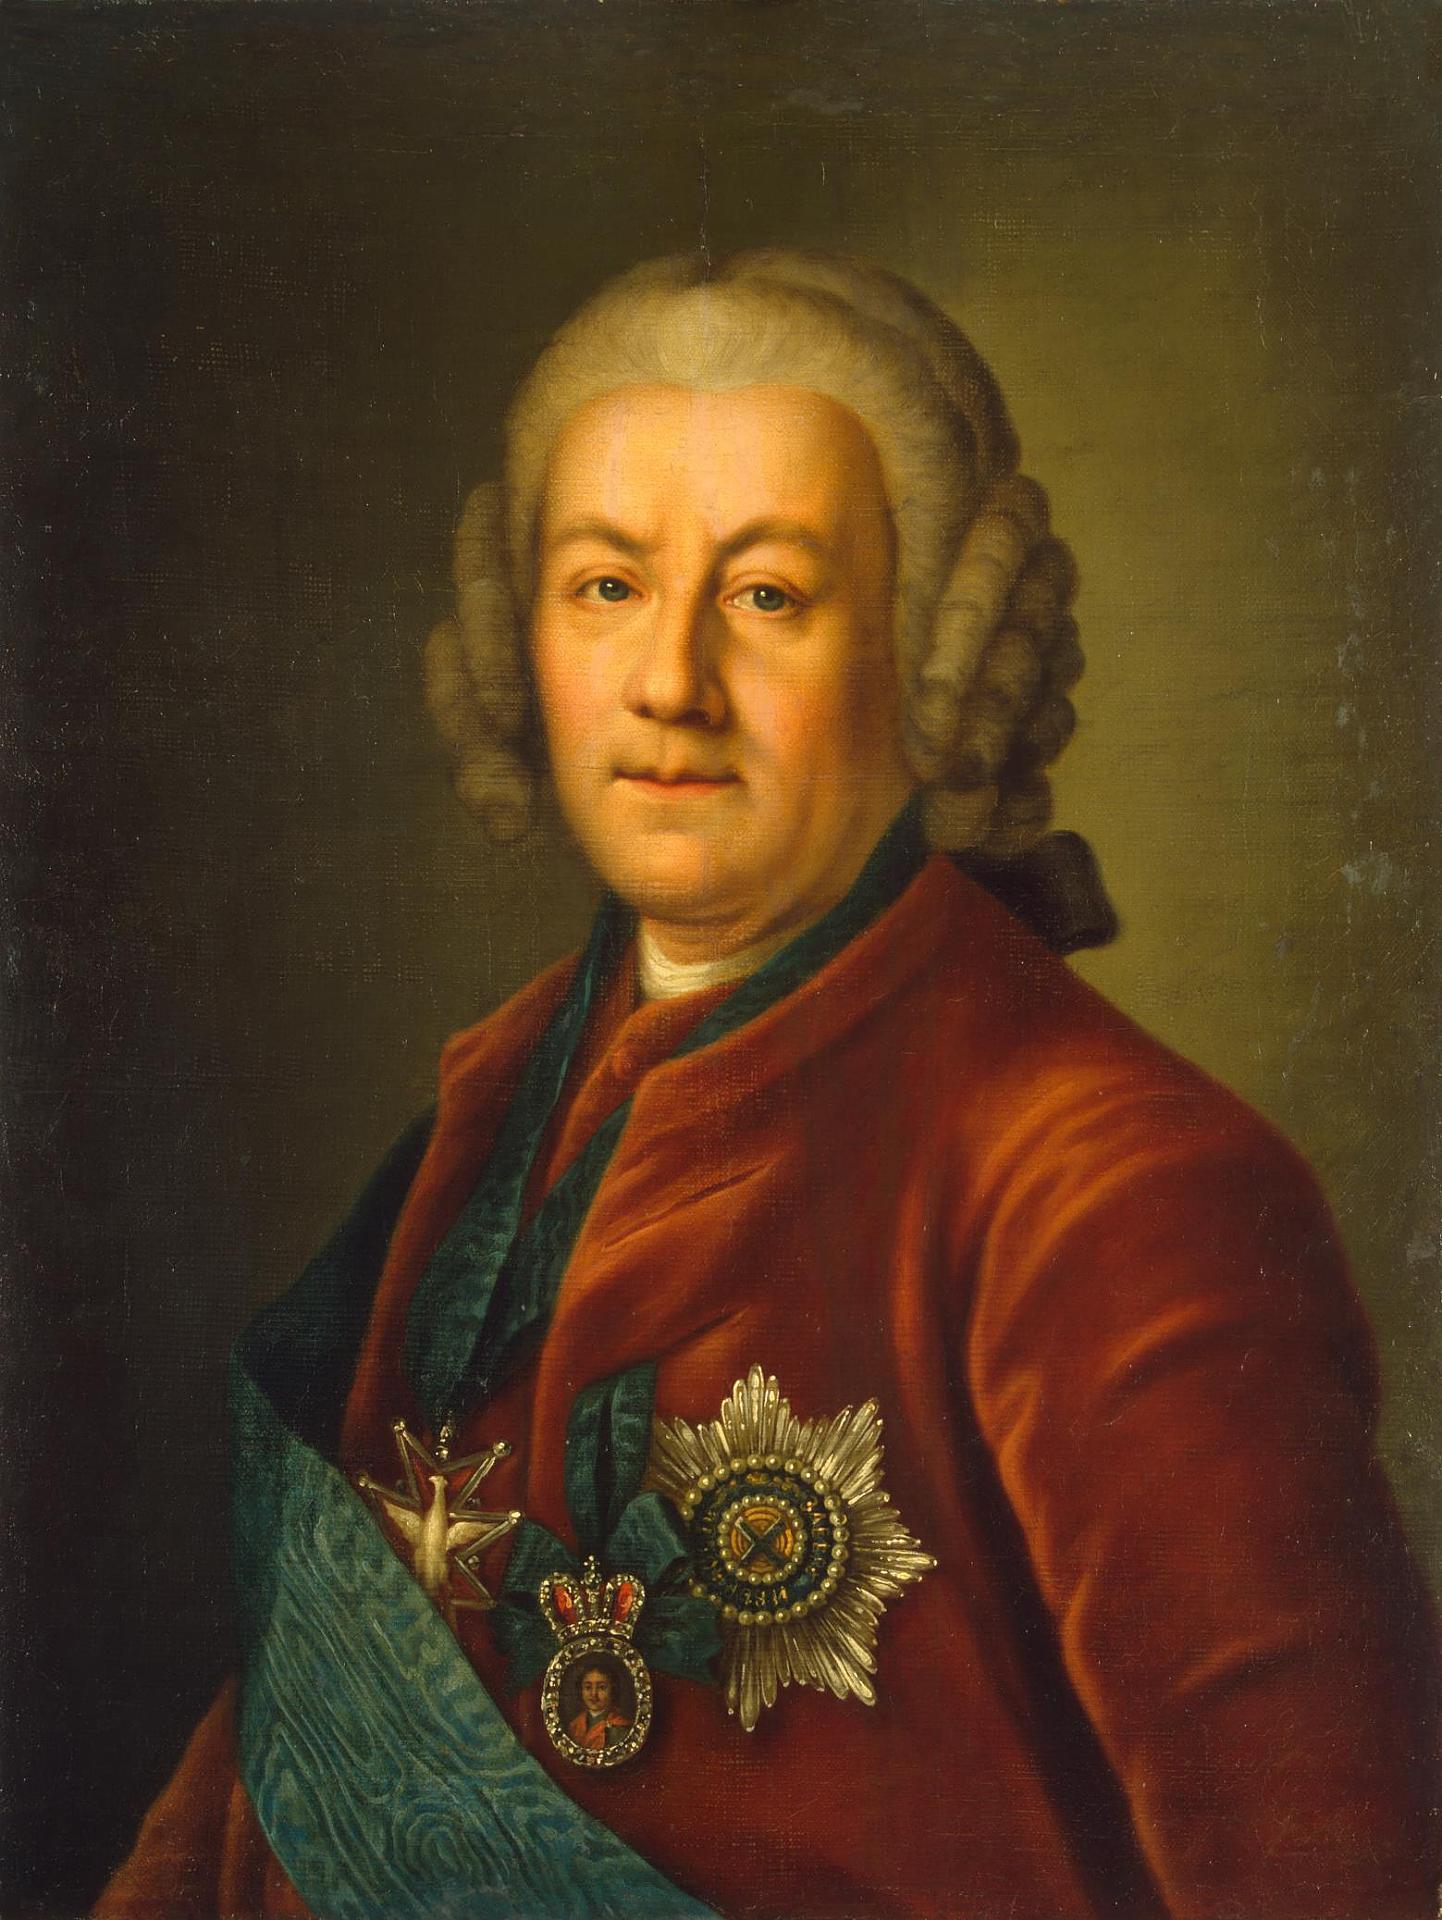 Бестужев-Рюмин, Алексей Петрович